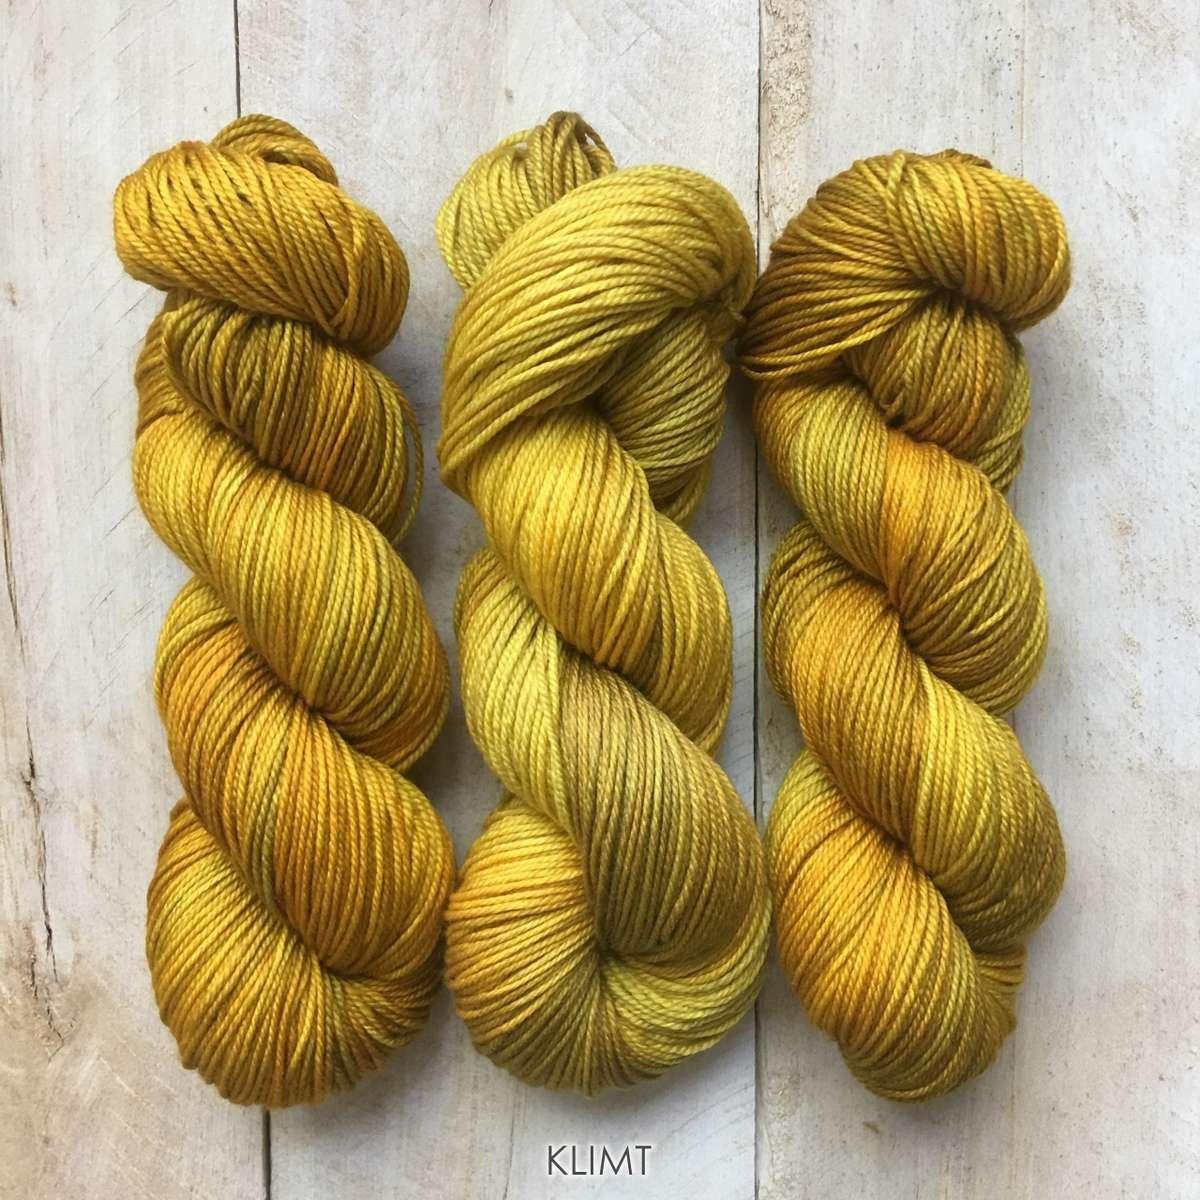 Hand-dyed yarn Louise Robert Klimt